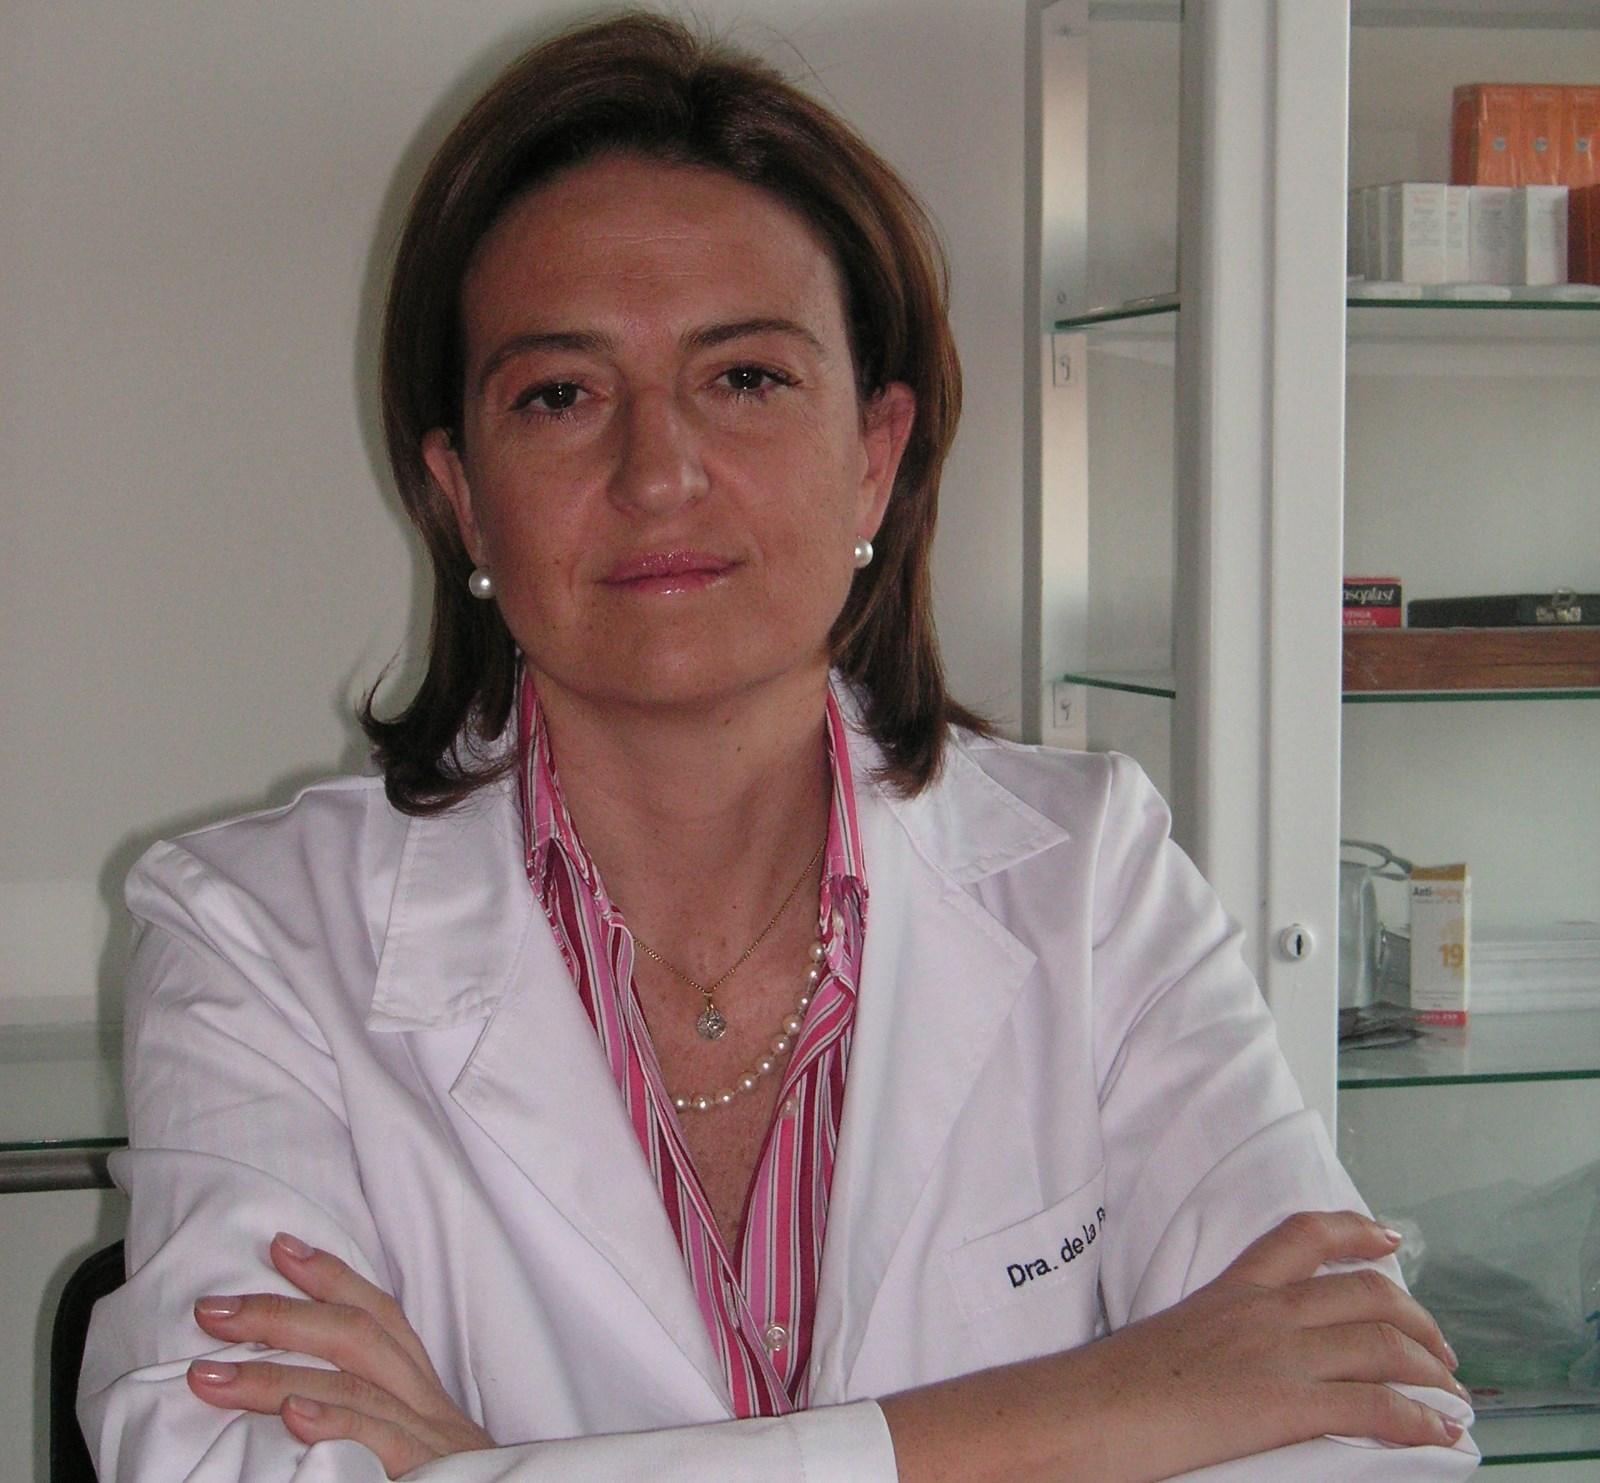 Dra. Lola de la Puerta